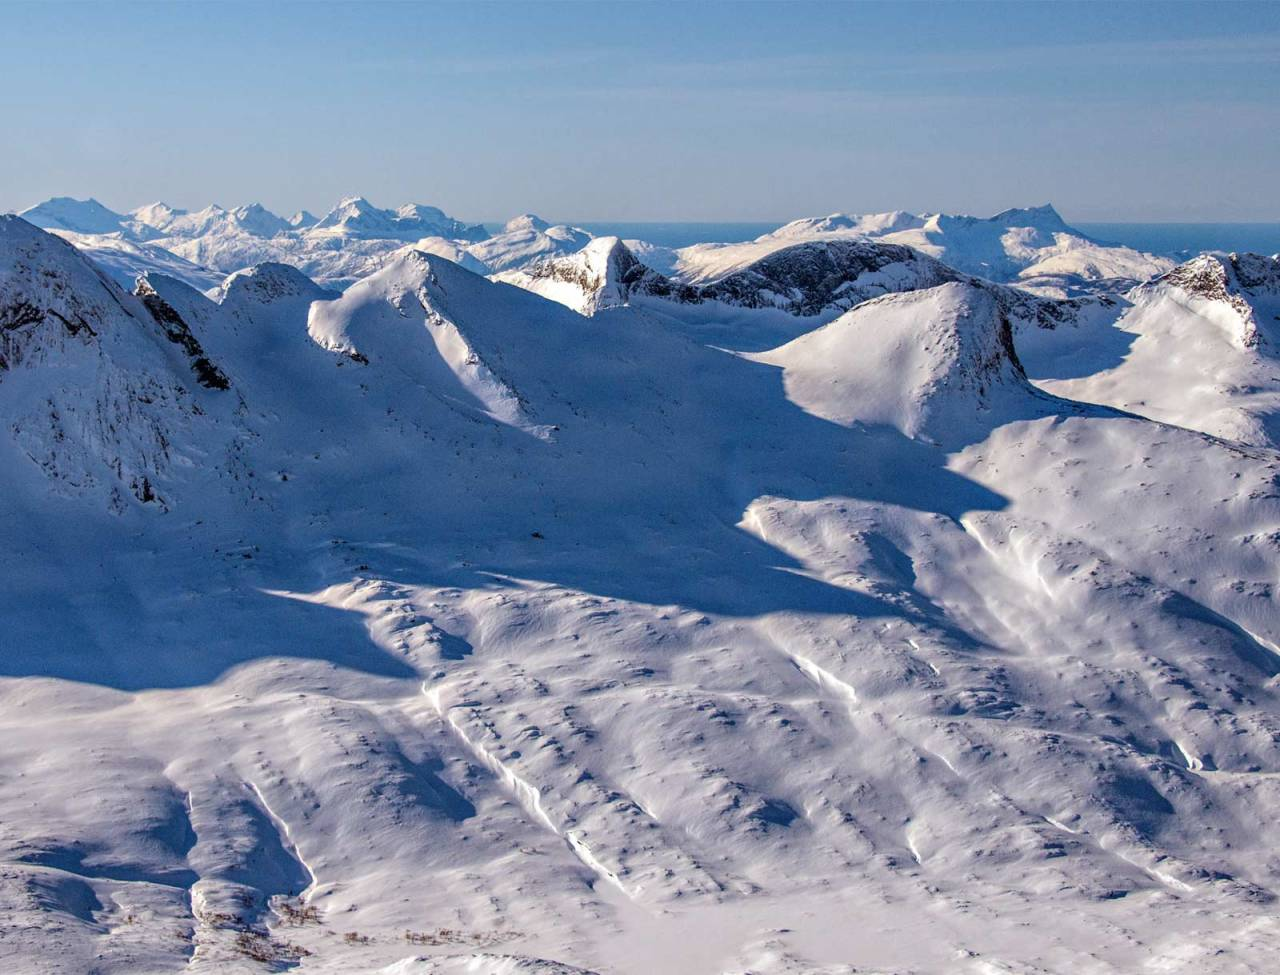 Børtindan, med Ryptinden i midten, sett fra nordøst. Foto: Torgeir Kjus. / Trygge toppturer.